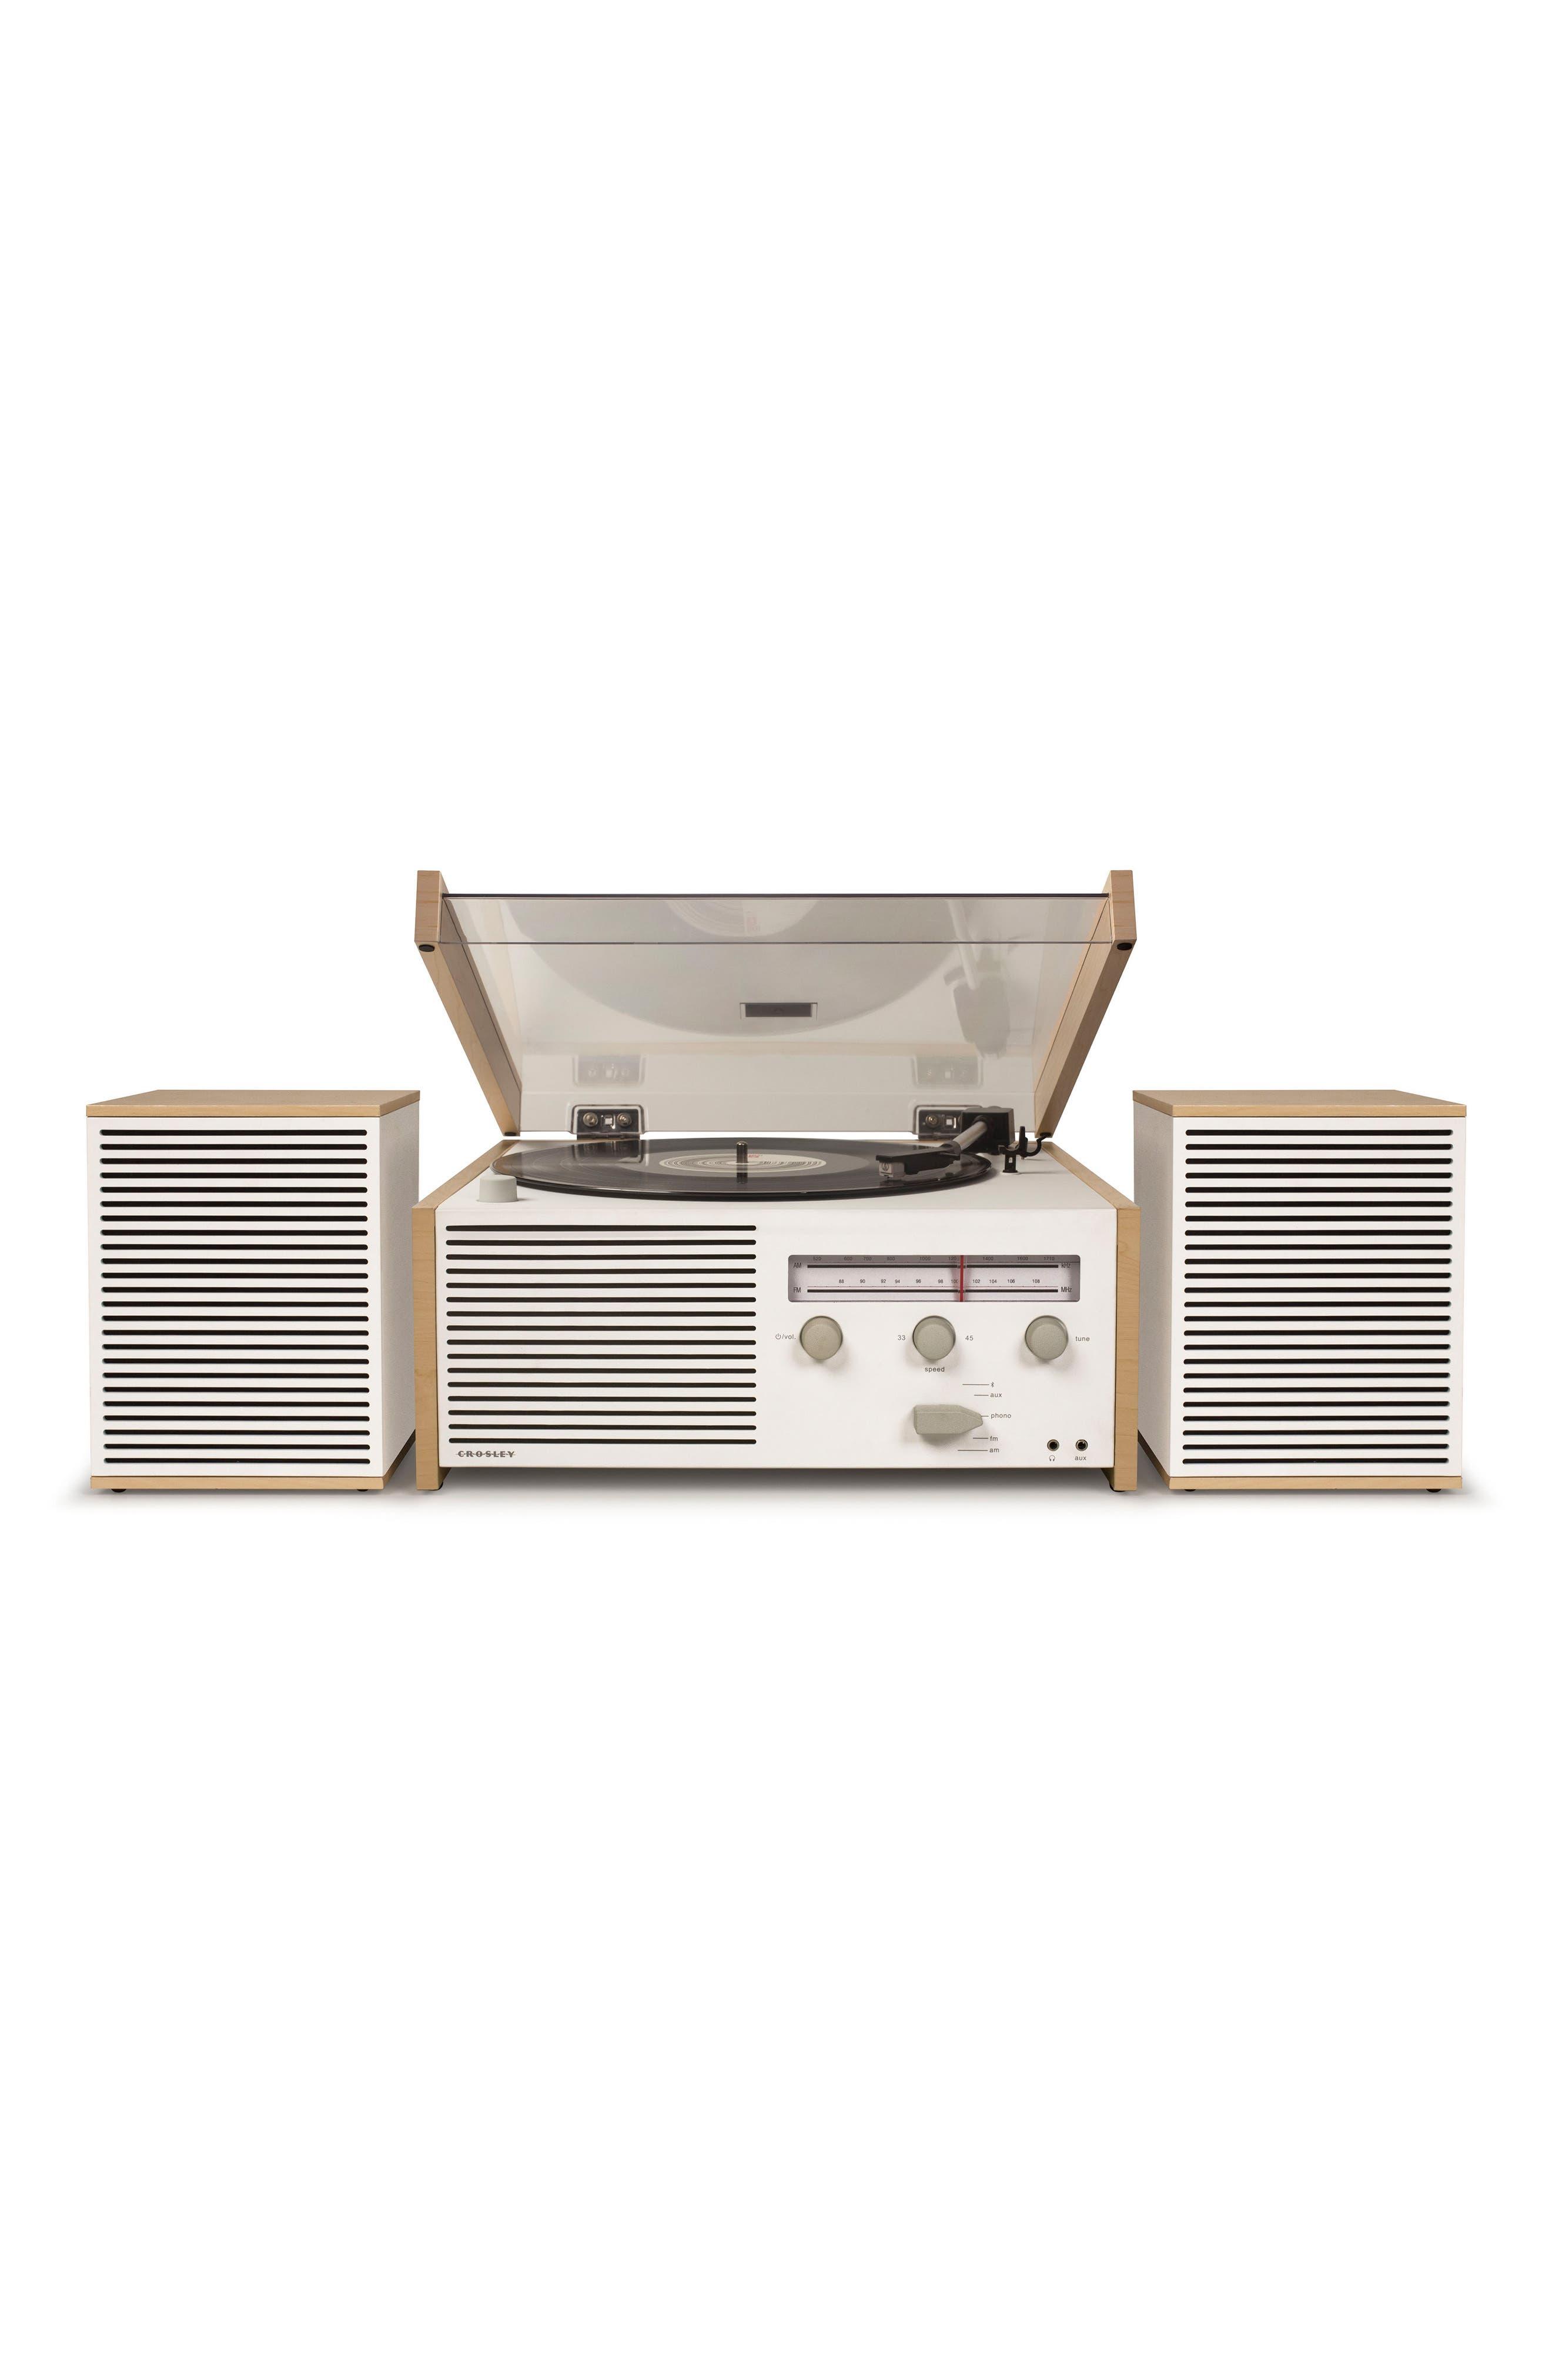 Alternate Image 1 Selected - Crosley Radio Switch II Turntable & Speakers Entertainment System